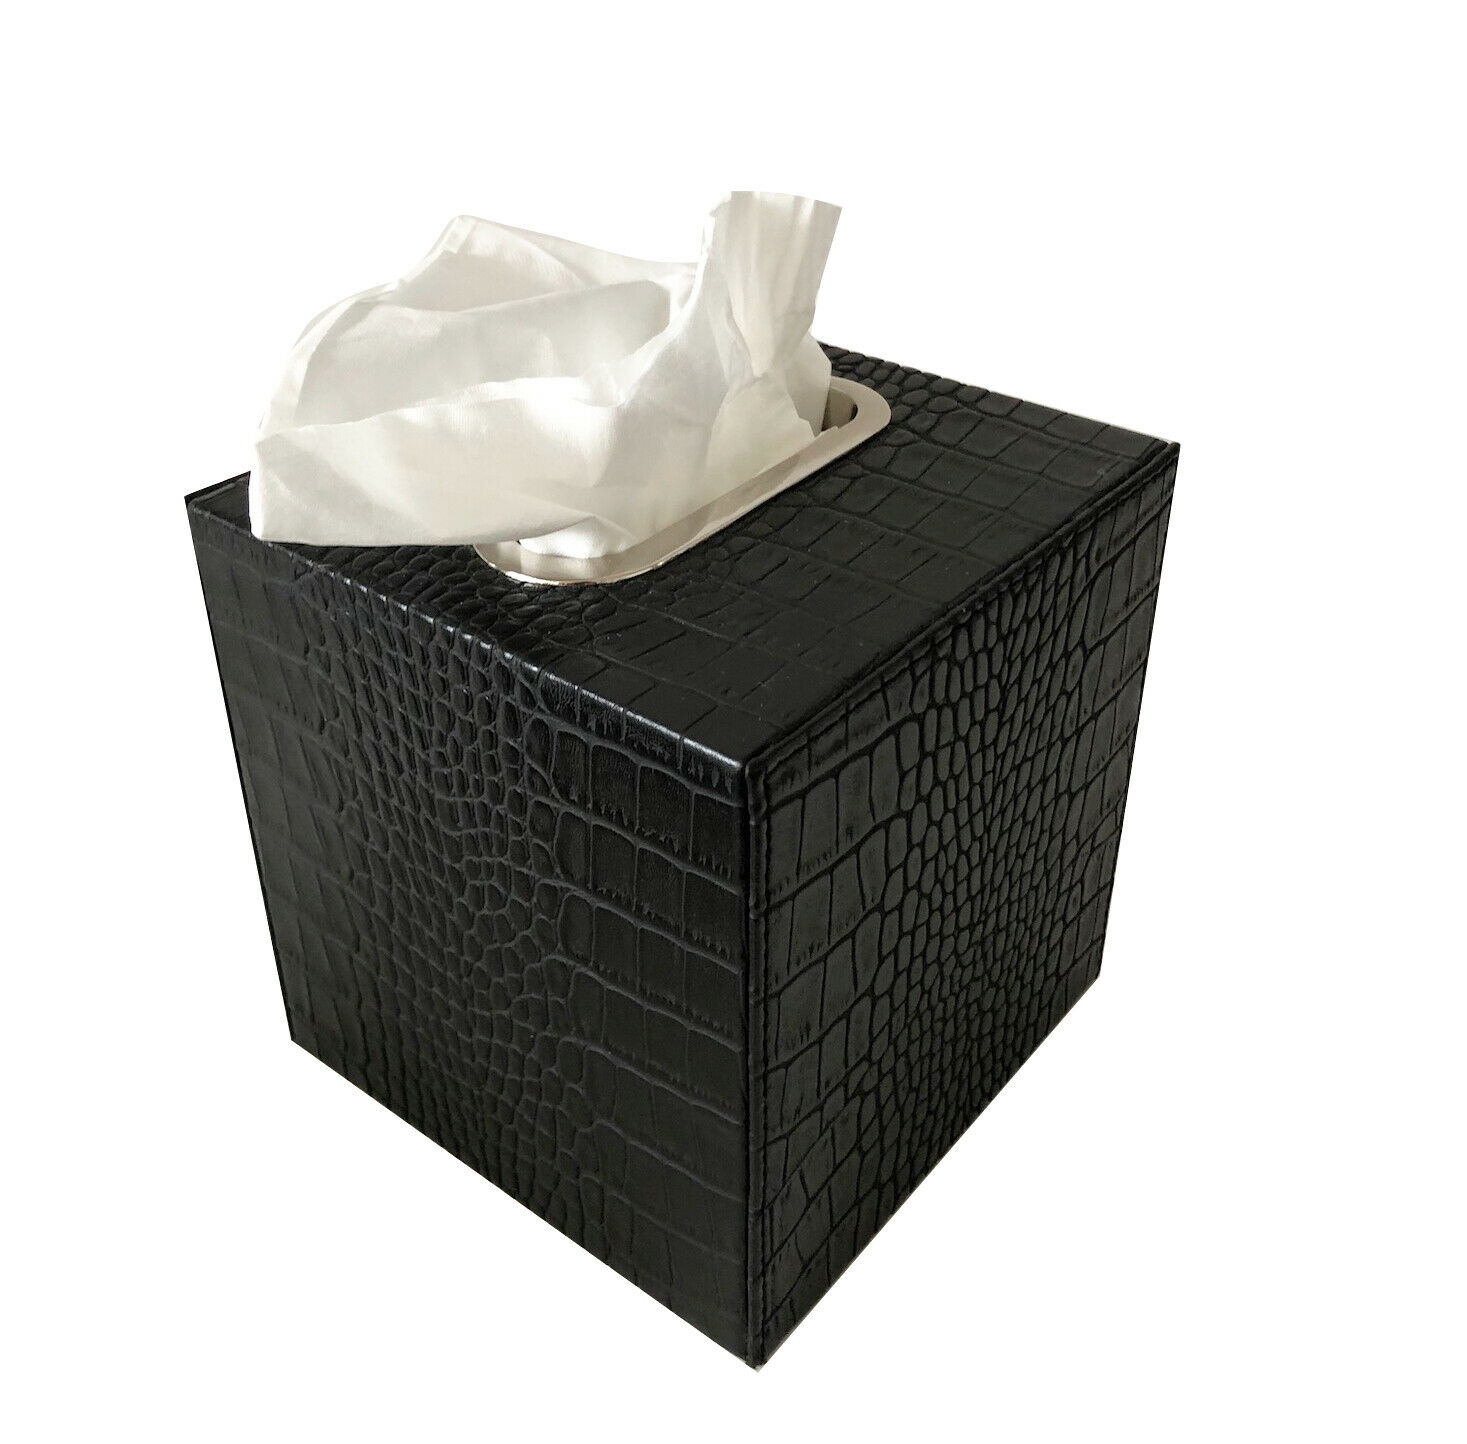 Tissue-Box Kosmetiktuchbox Leder Krokoprint schwarz Edelstahlring